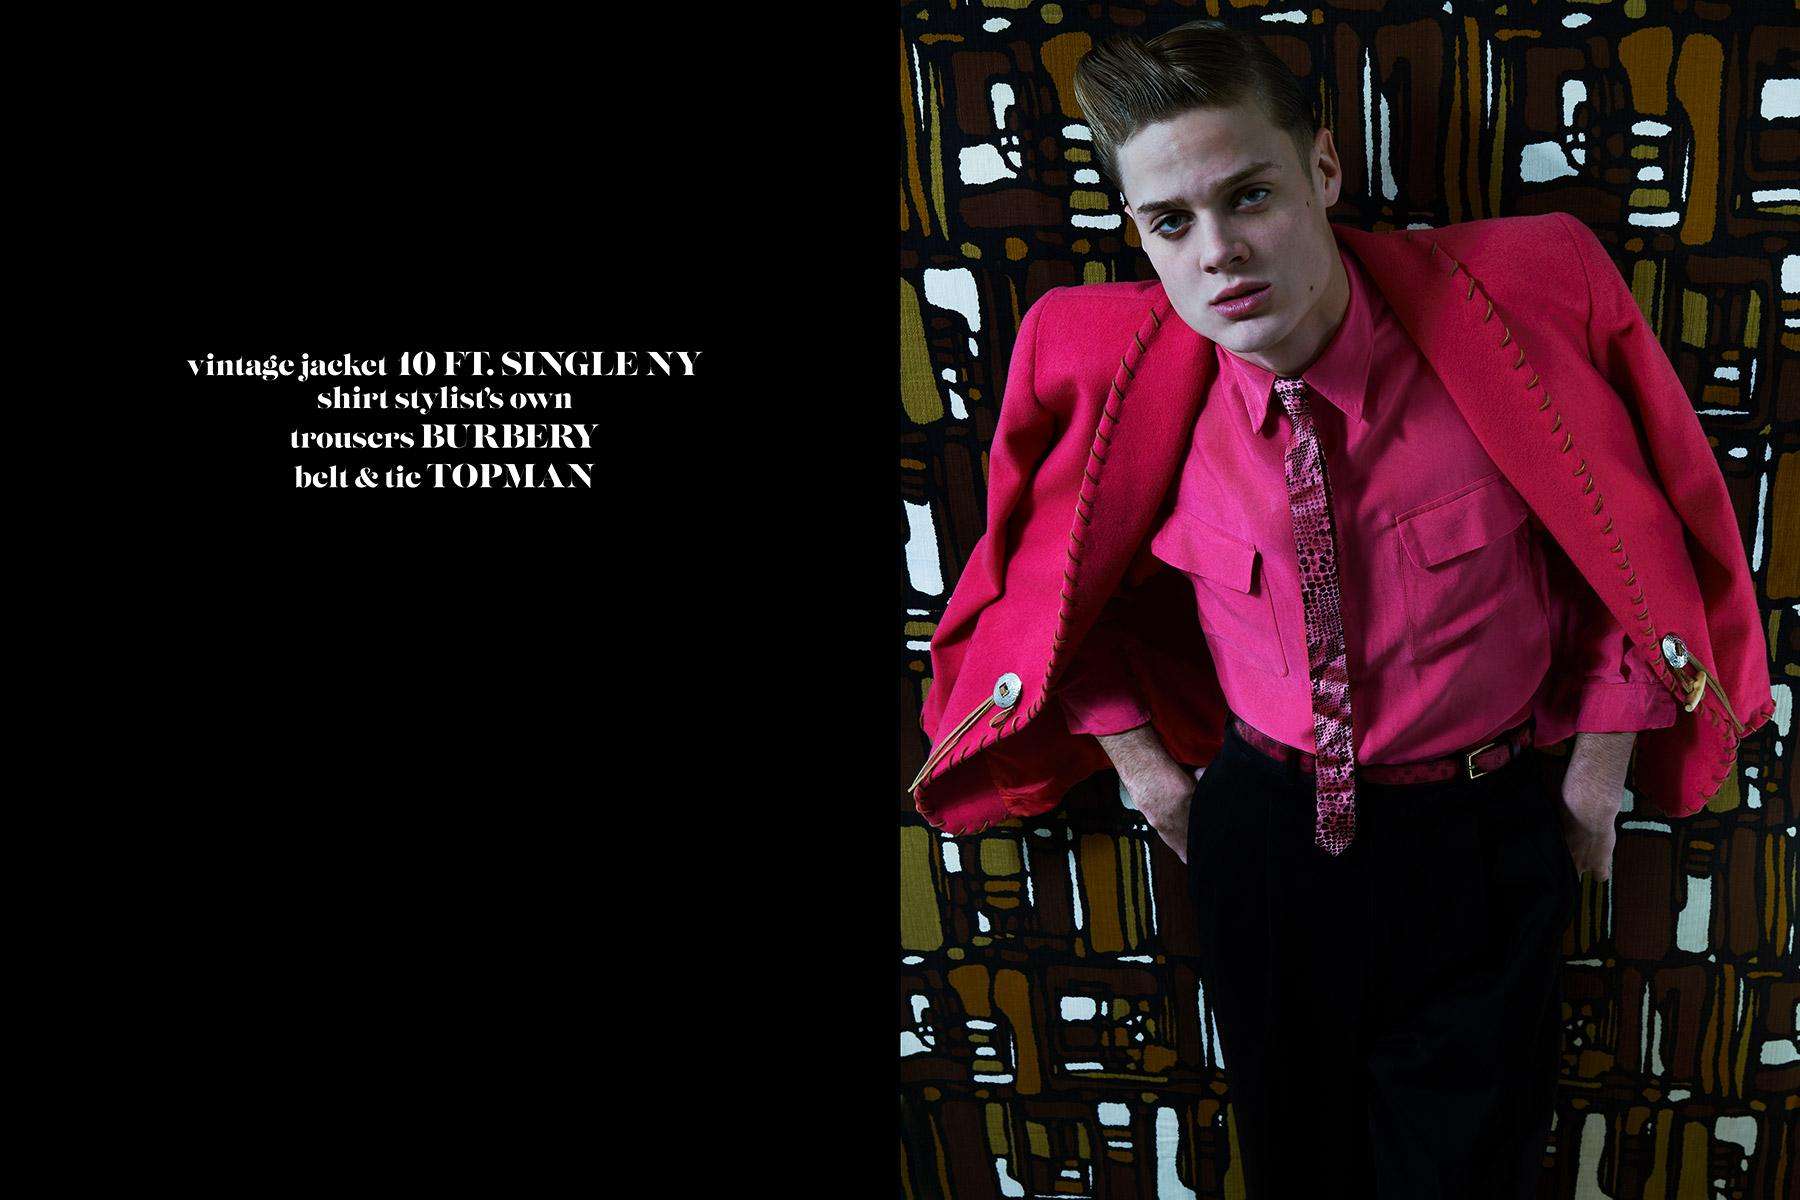 Model Jake Lauria photographed for Ponyboy magazine 50s editorial